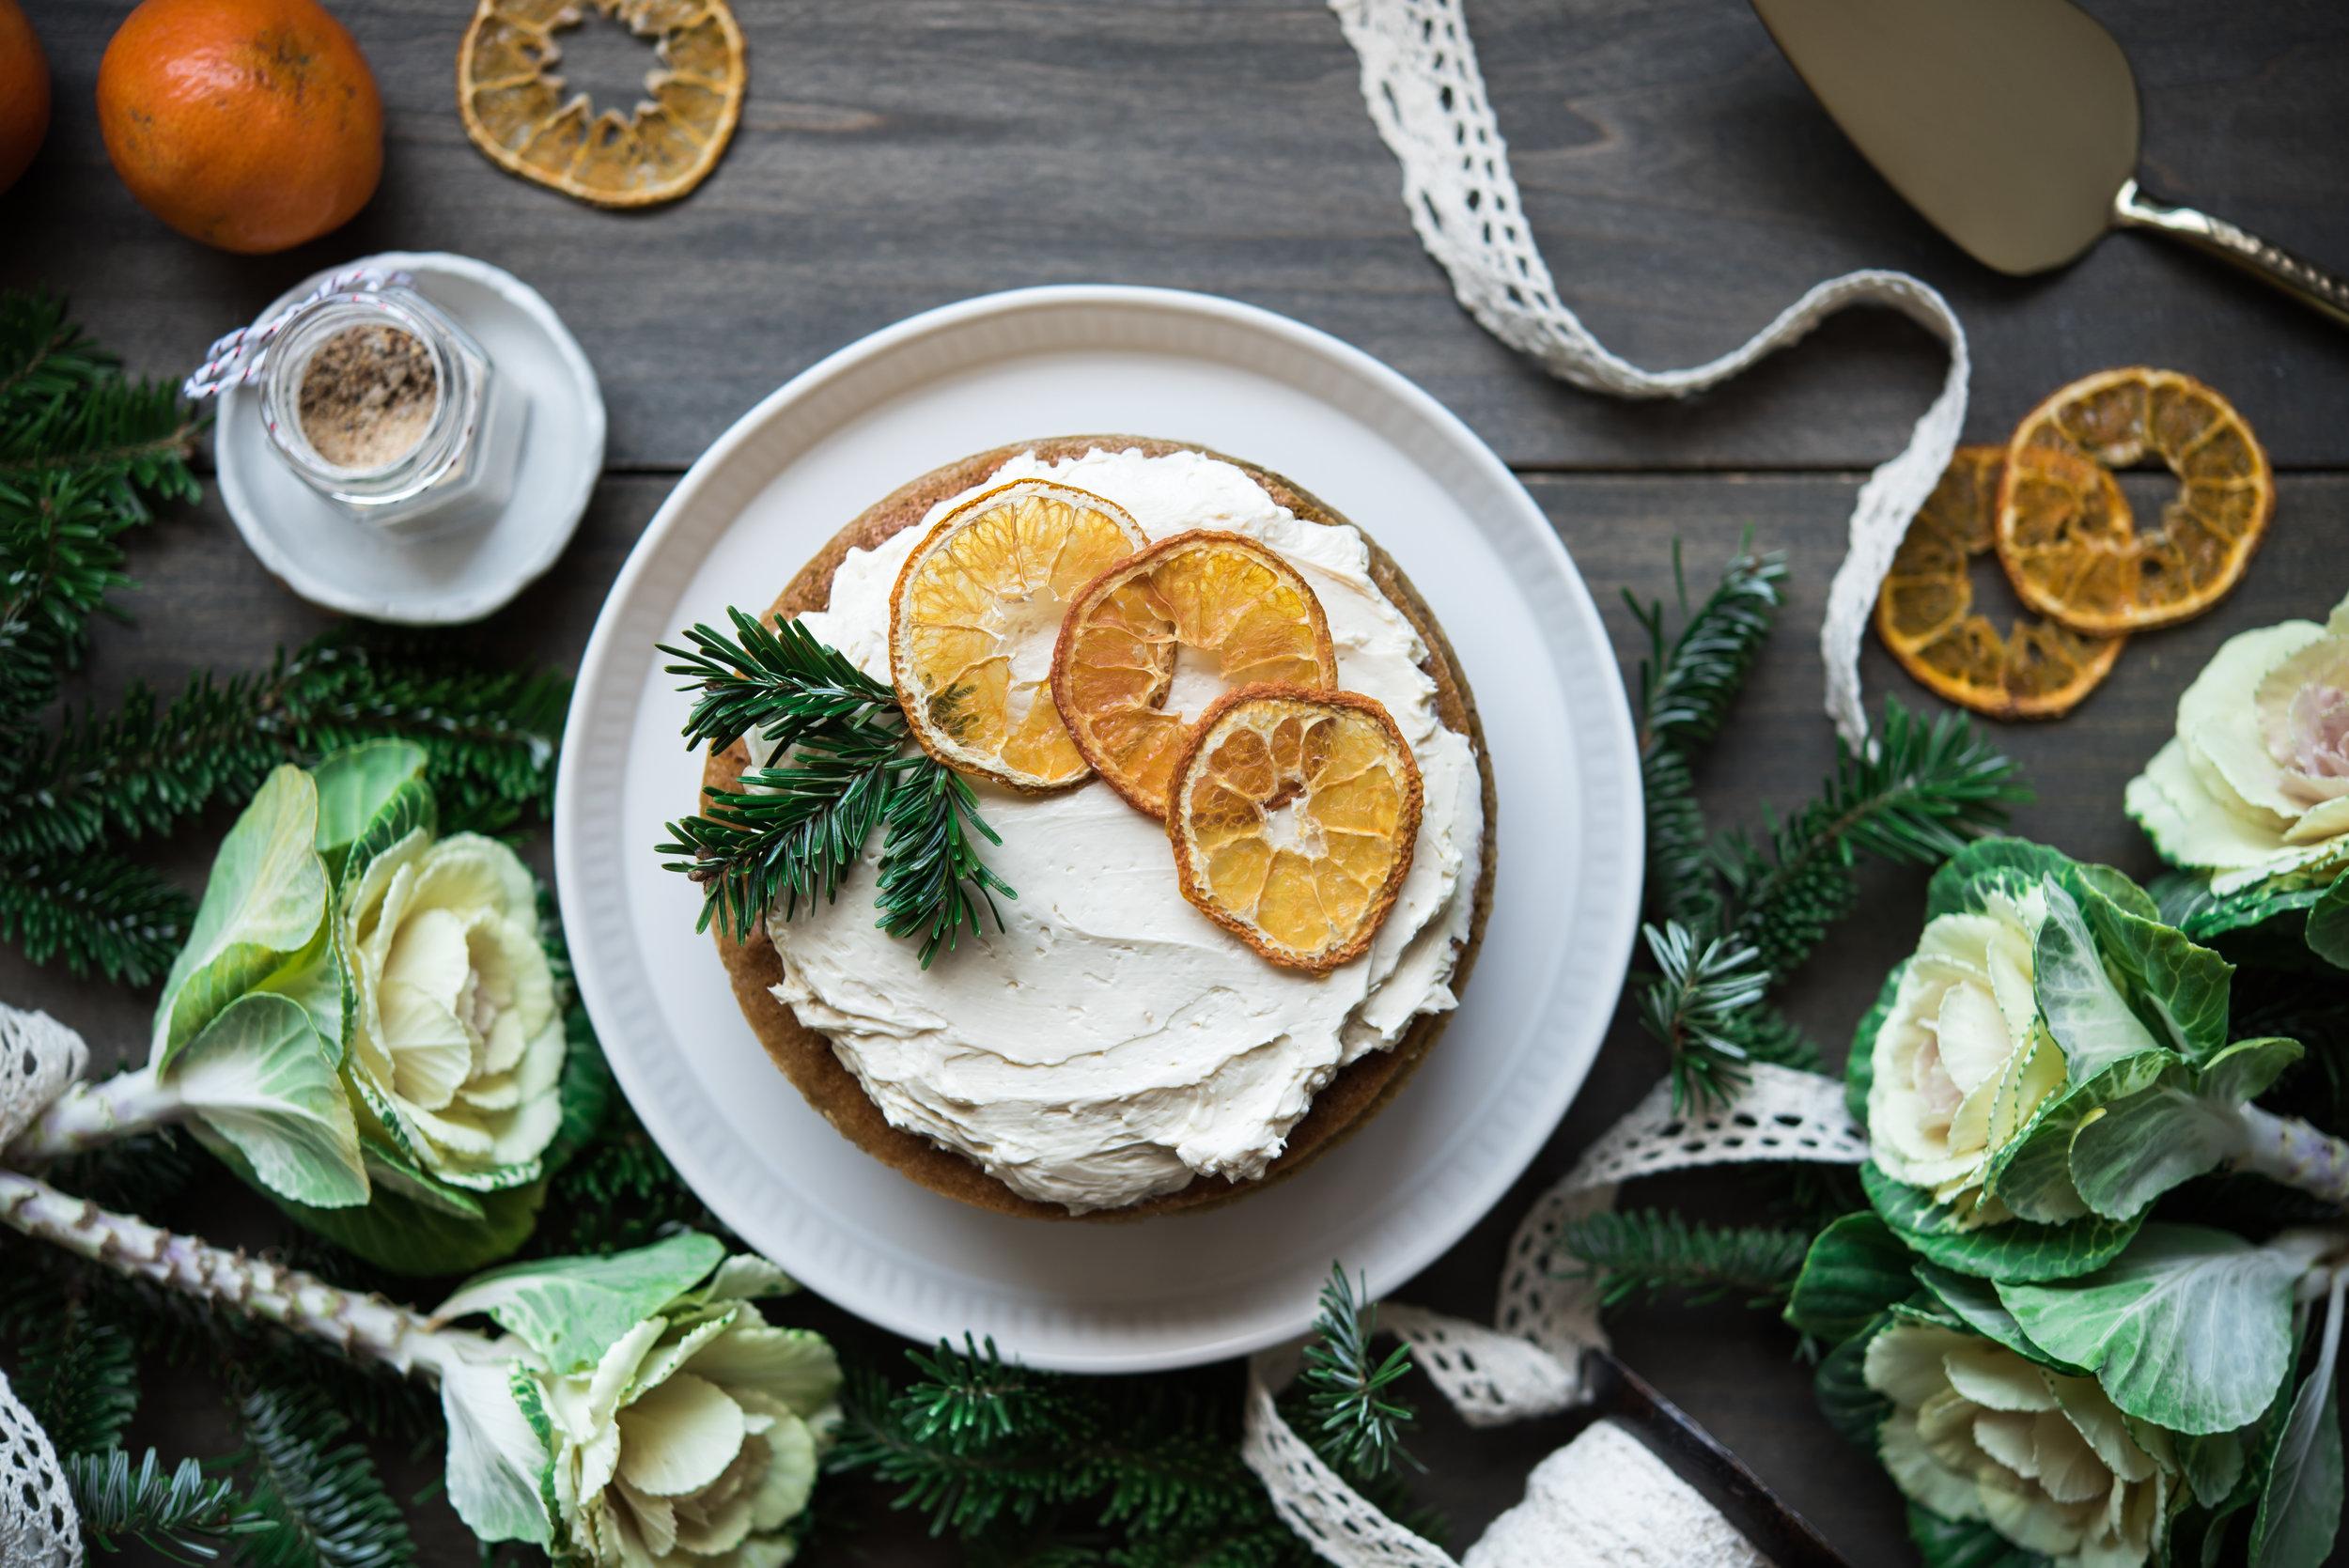 winter spice cake-9968.jpg